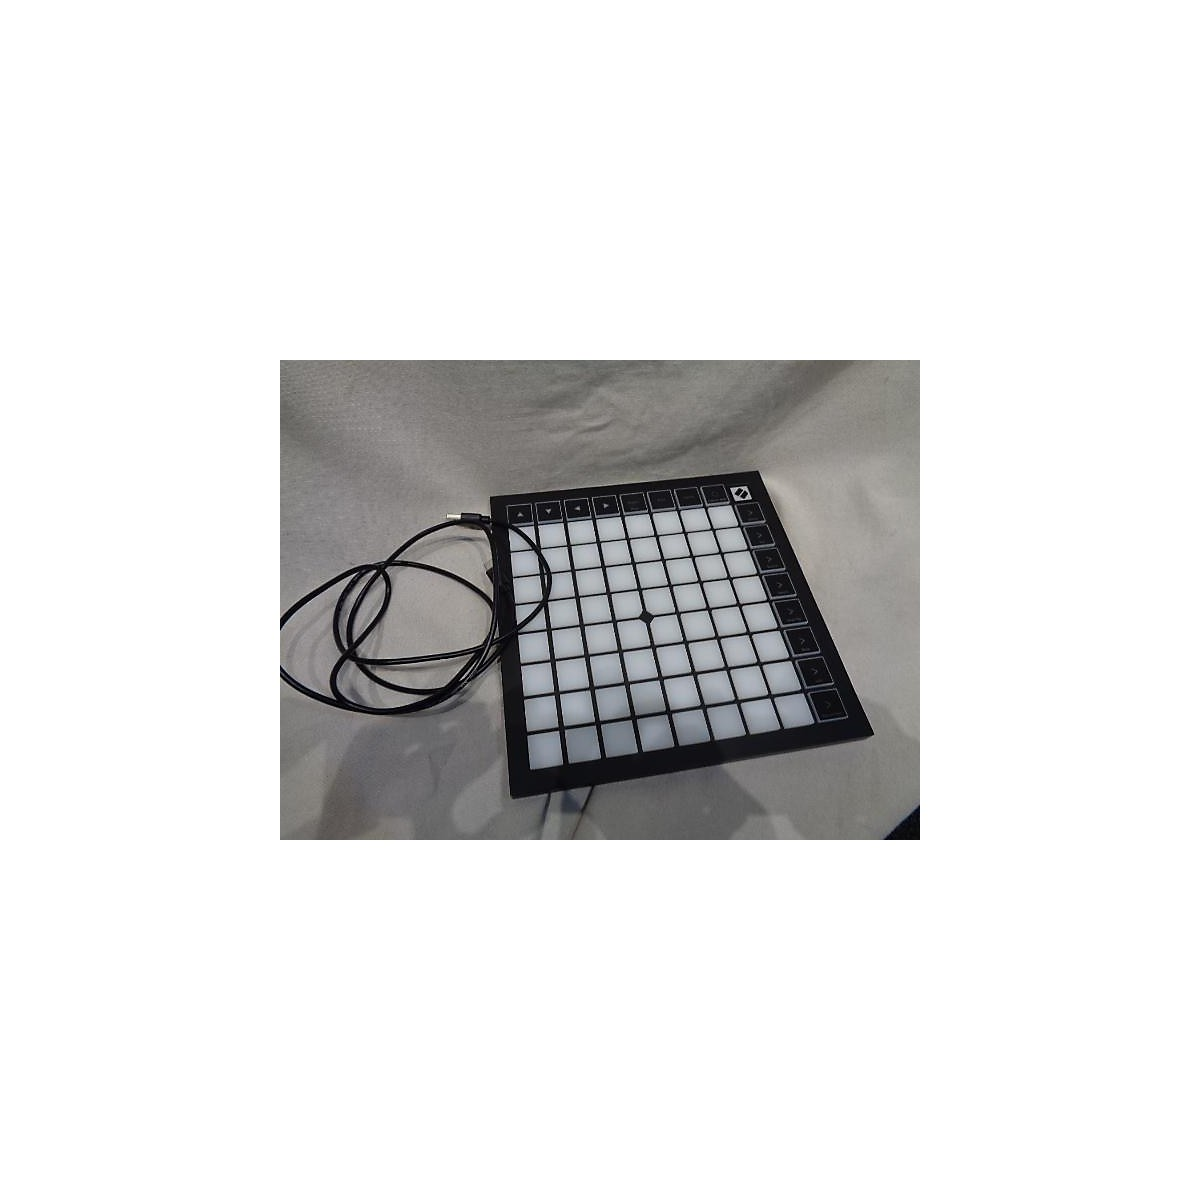 Novation Launchpad X Arranger Keyboard